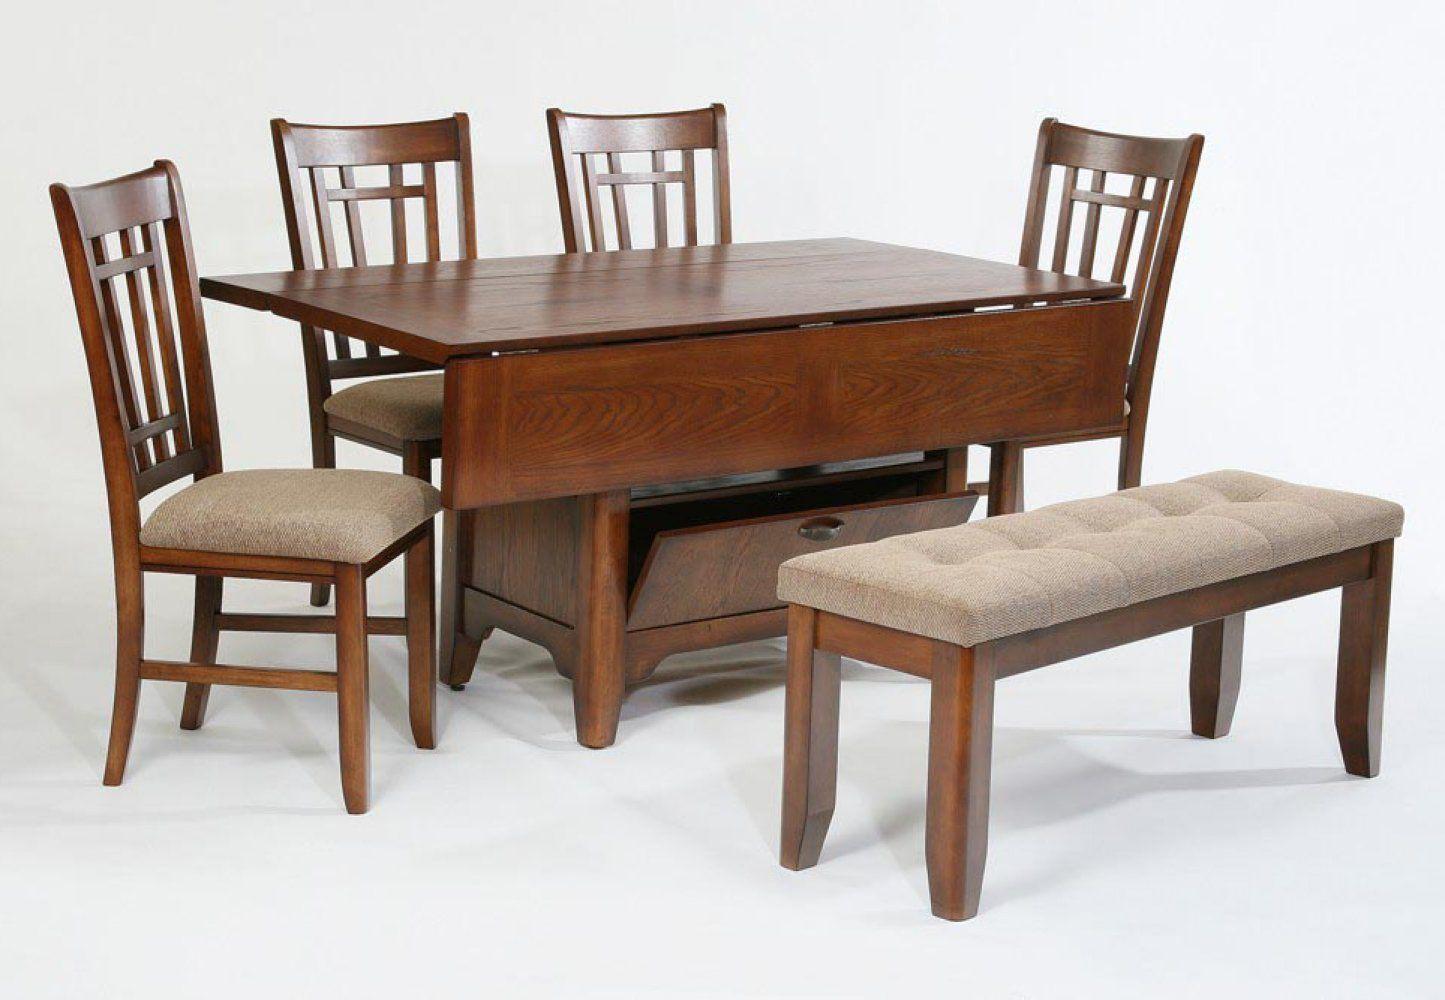 Set Meja Makan Minimalis  Mebel Jepara  Furniture Jati Jepara Stunning Dining Room Table And Chairs For 4 Inspiration Design